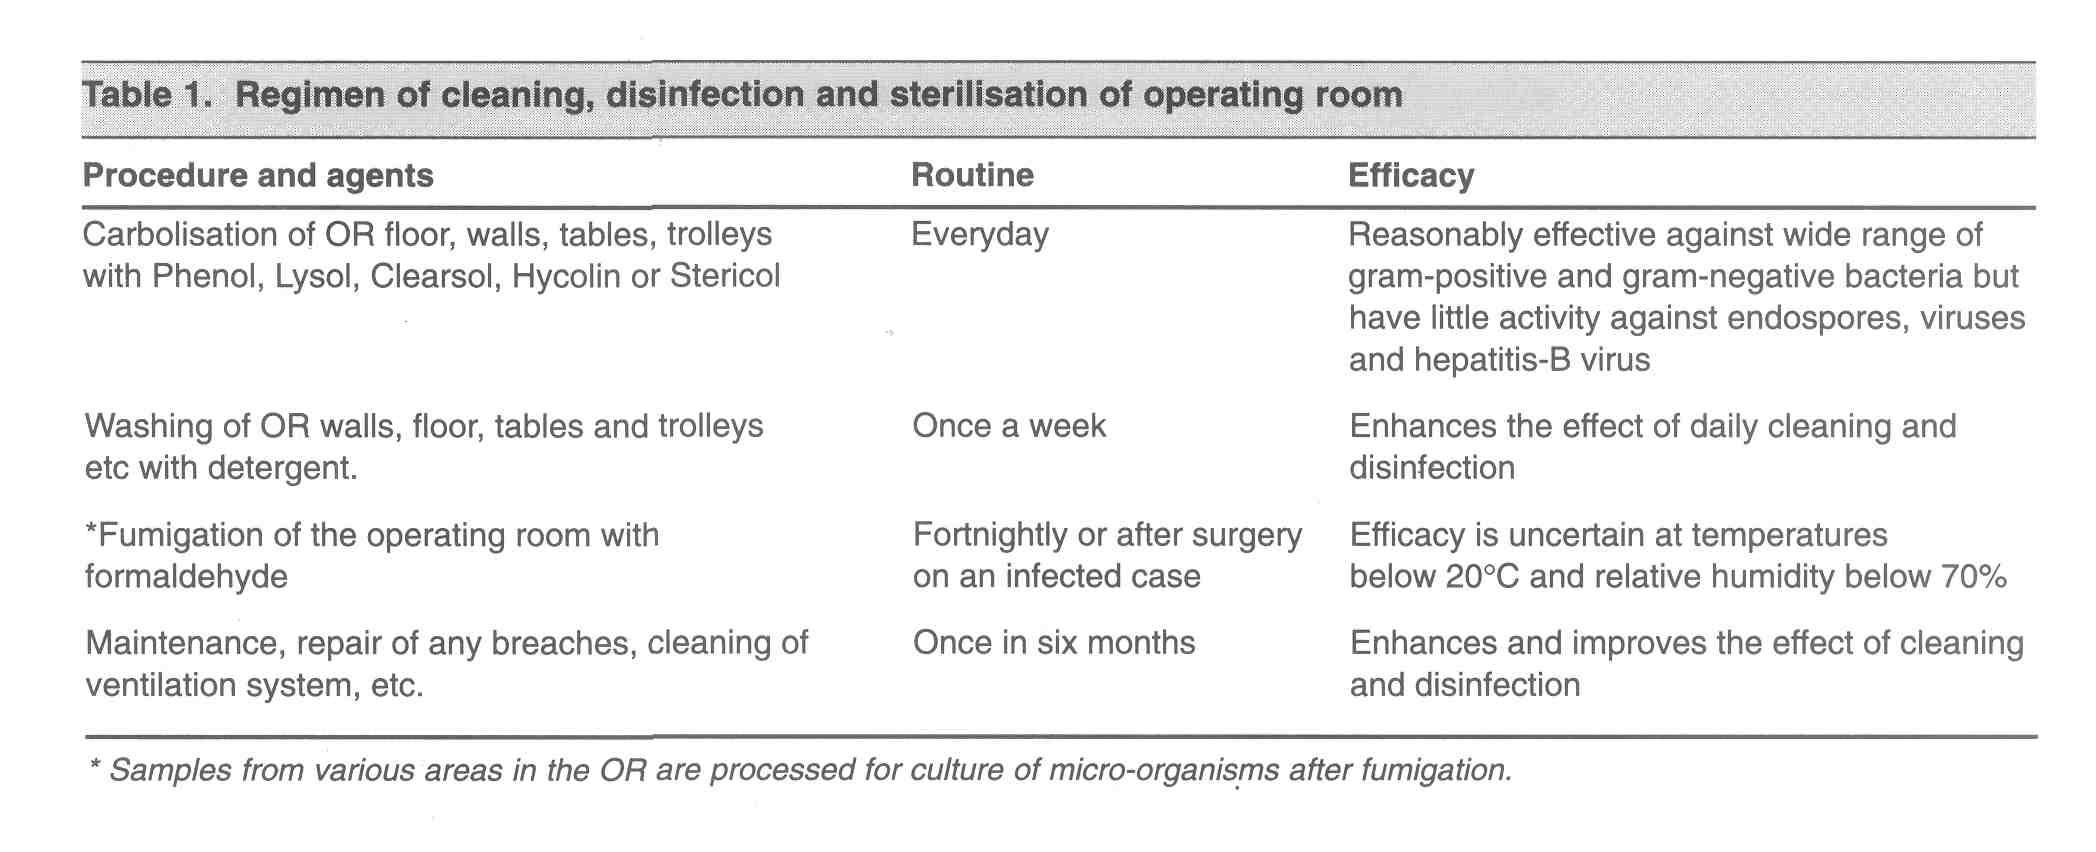 sterilization procedure of sharp instrument